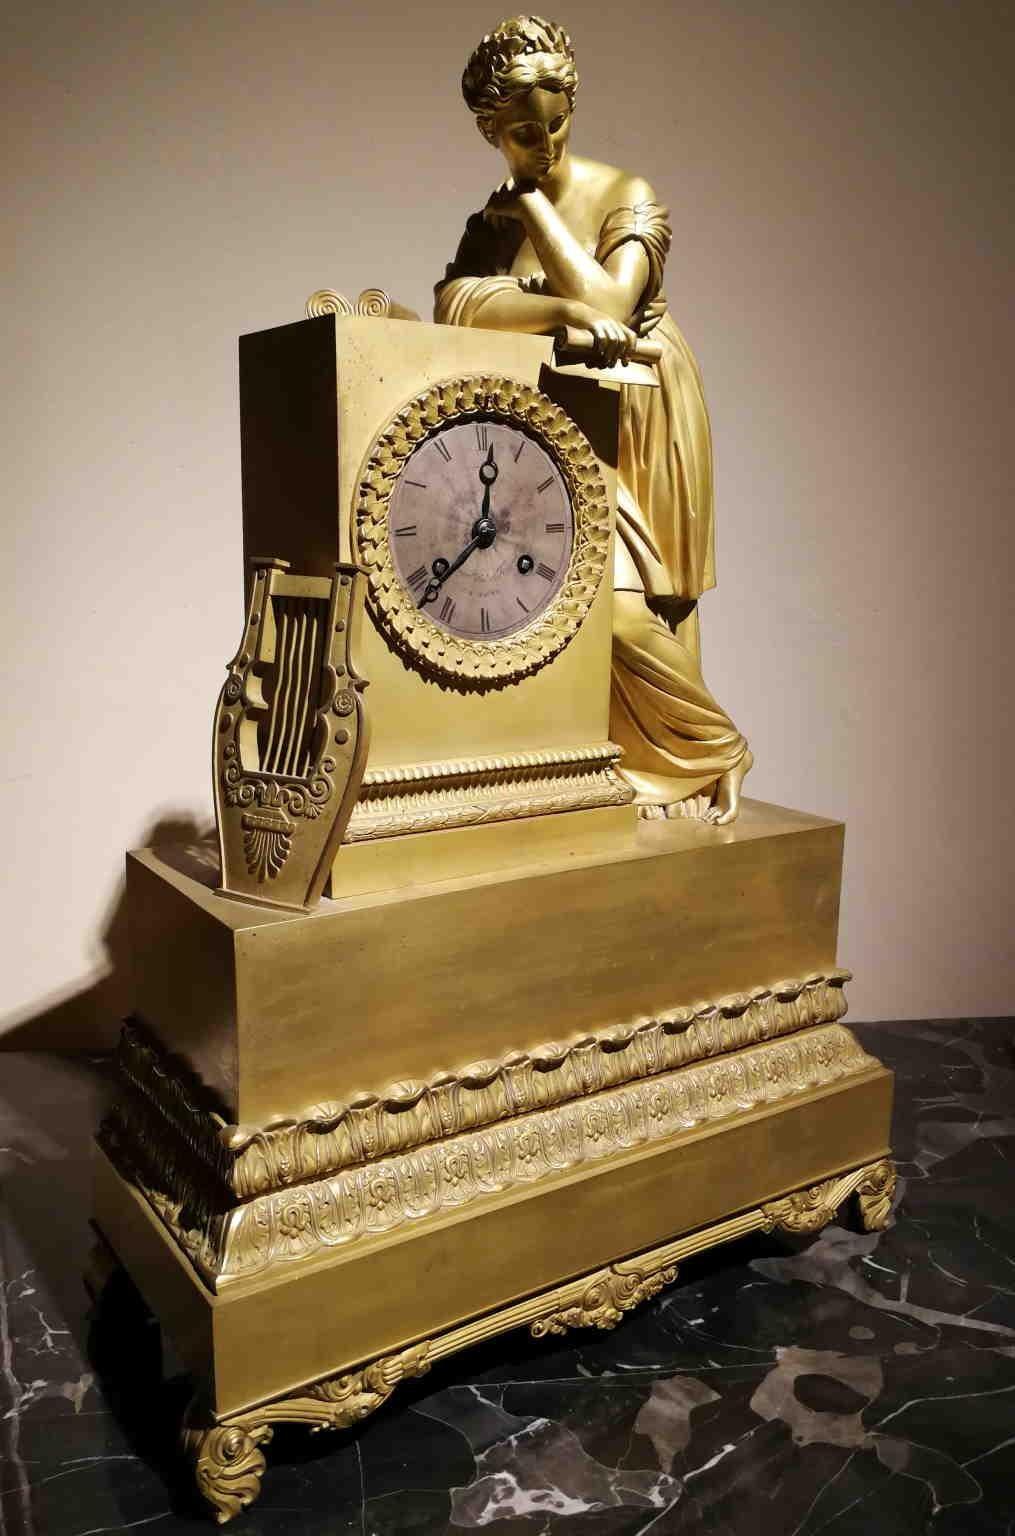 Honoré Pons et de Renard Gilded Bronze Mantel Clock 1827